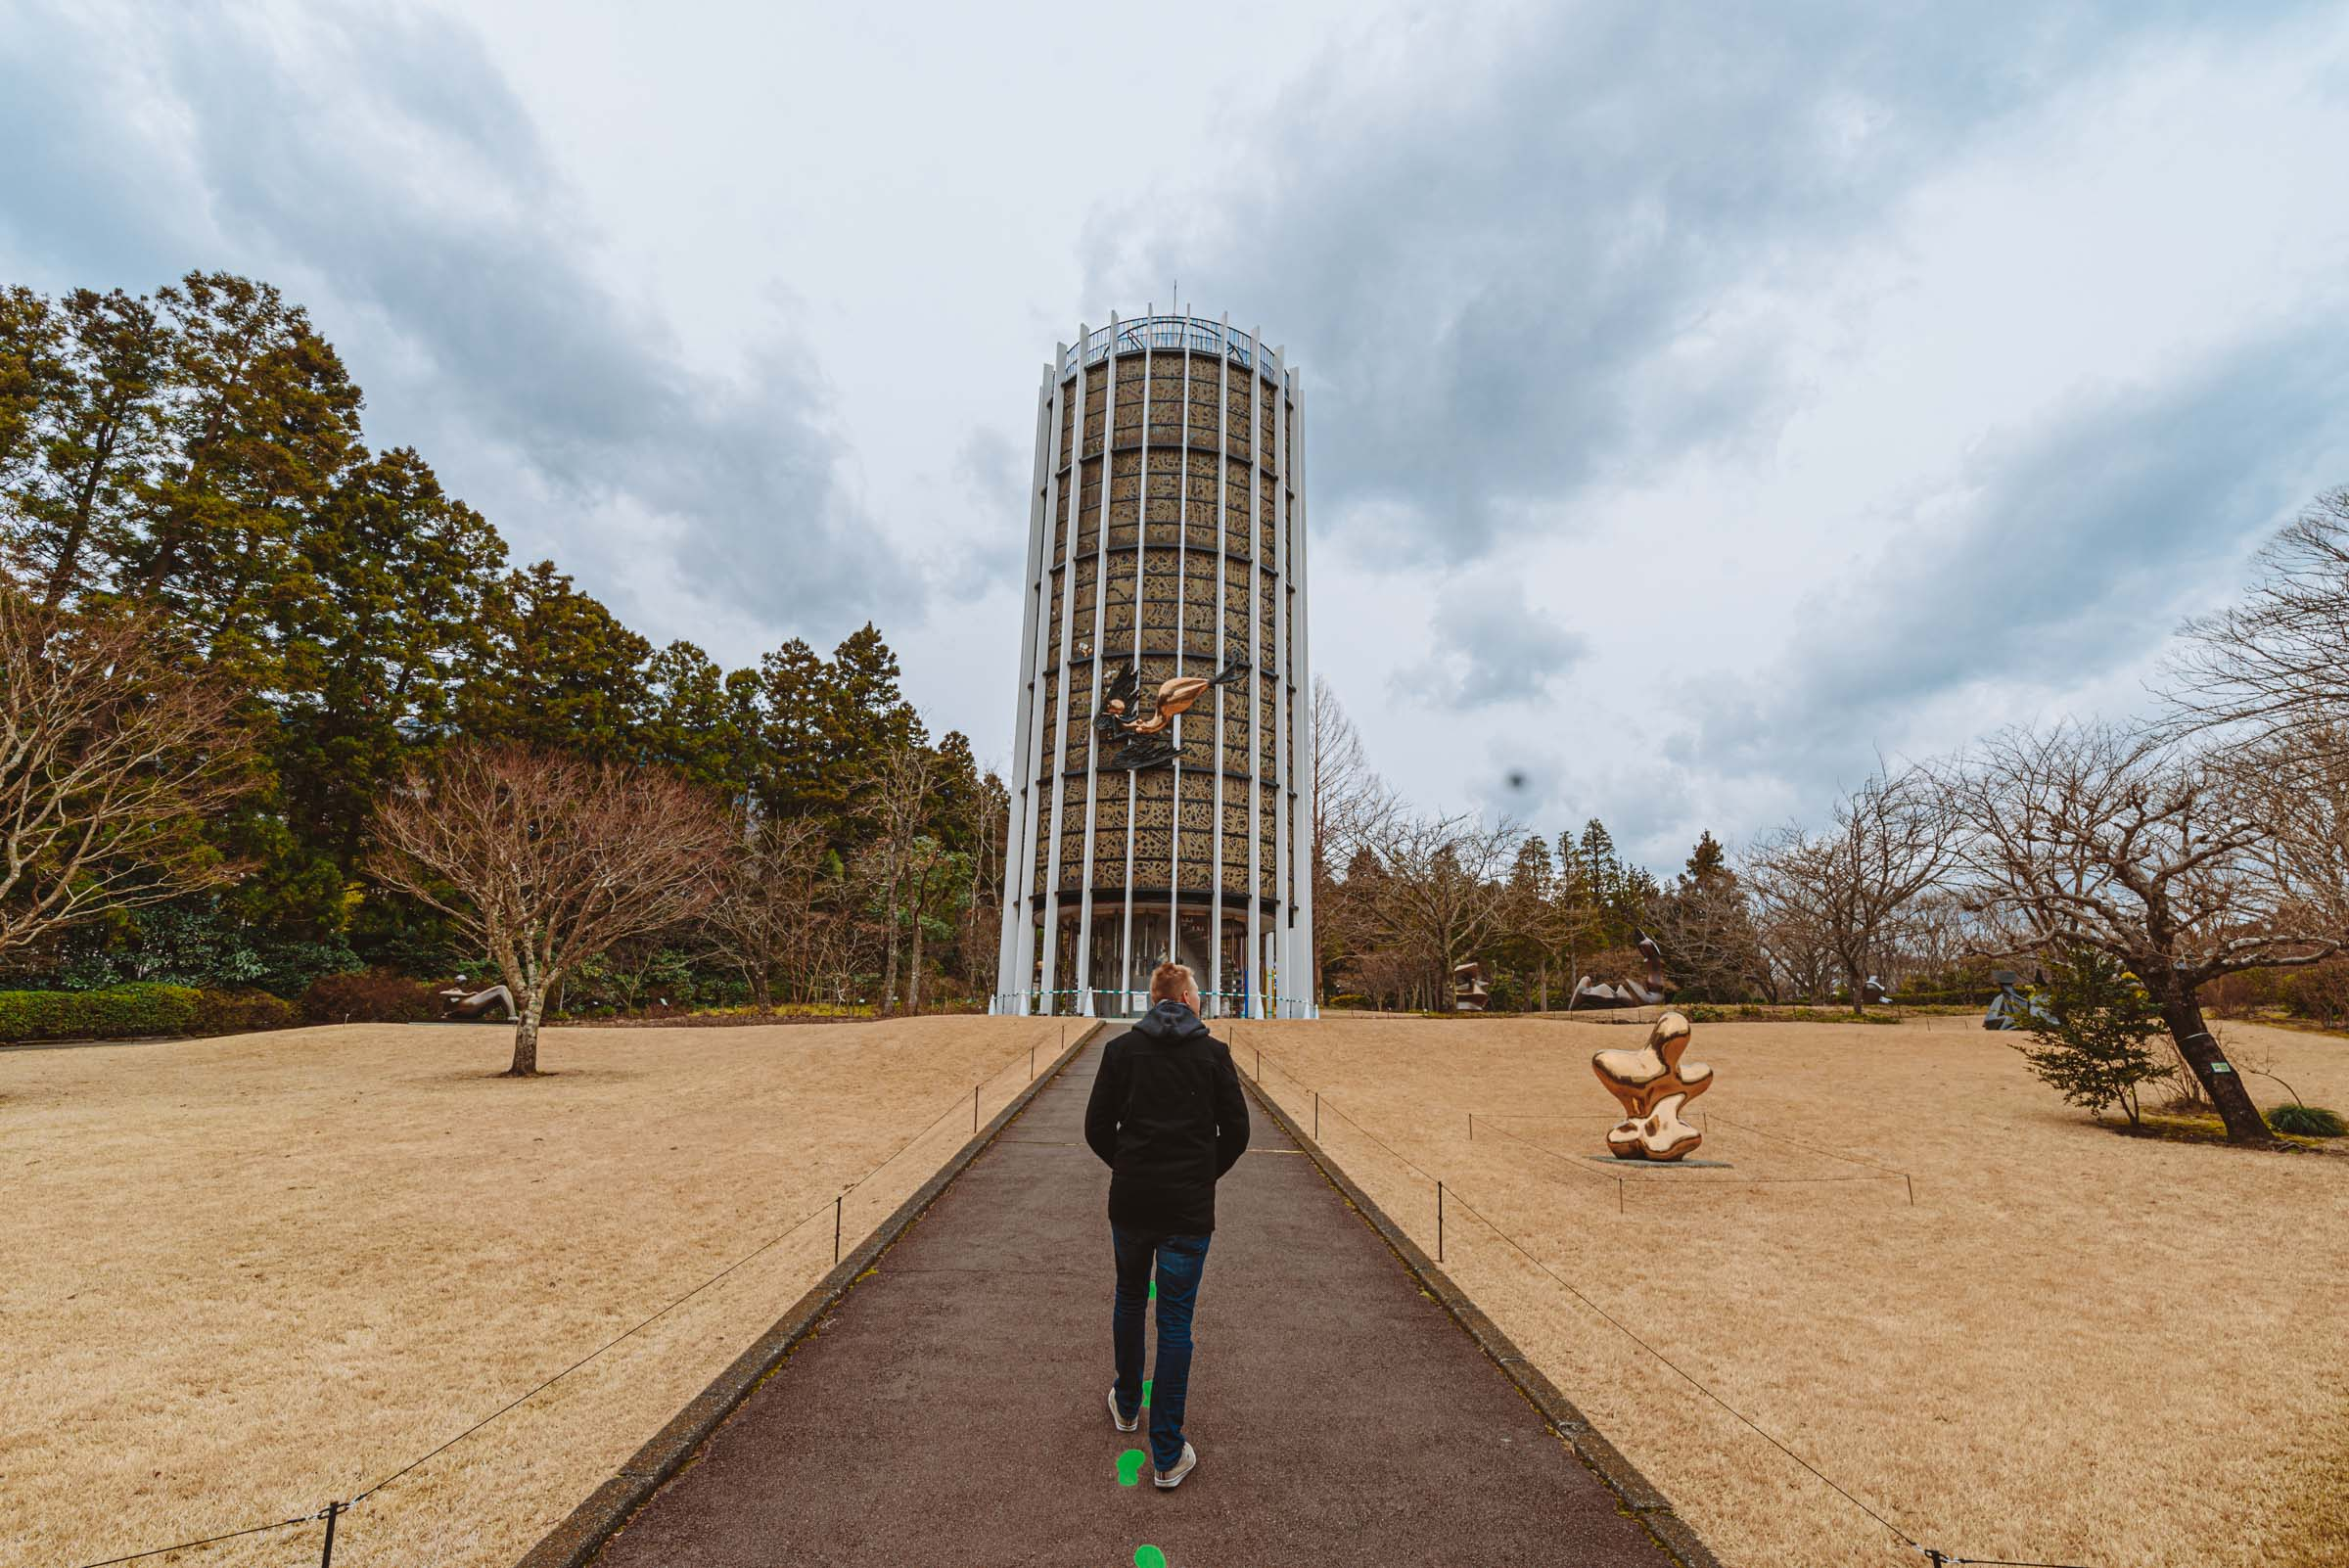 Hakone - Hakone Open-Air Museum